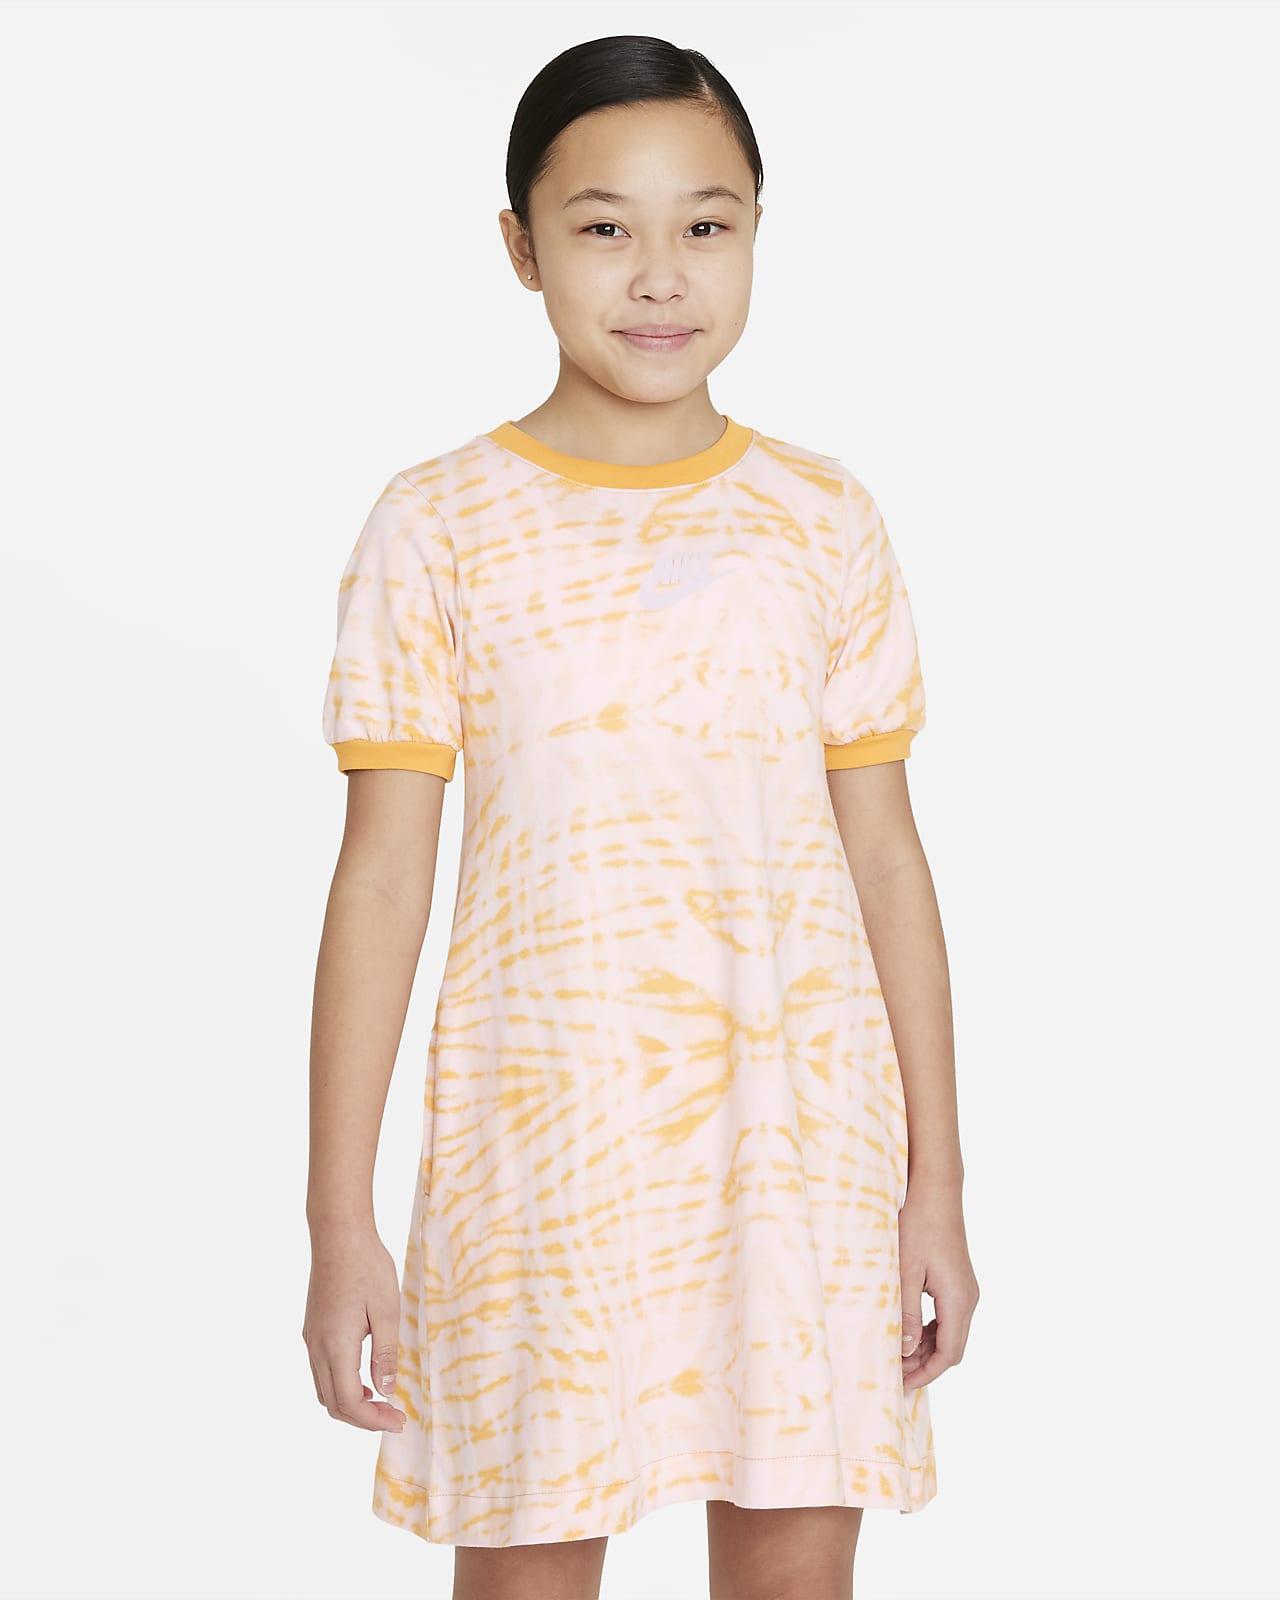 Nike Sportswear Older Kids' (Girls') Printed Short-Sleeve Dress